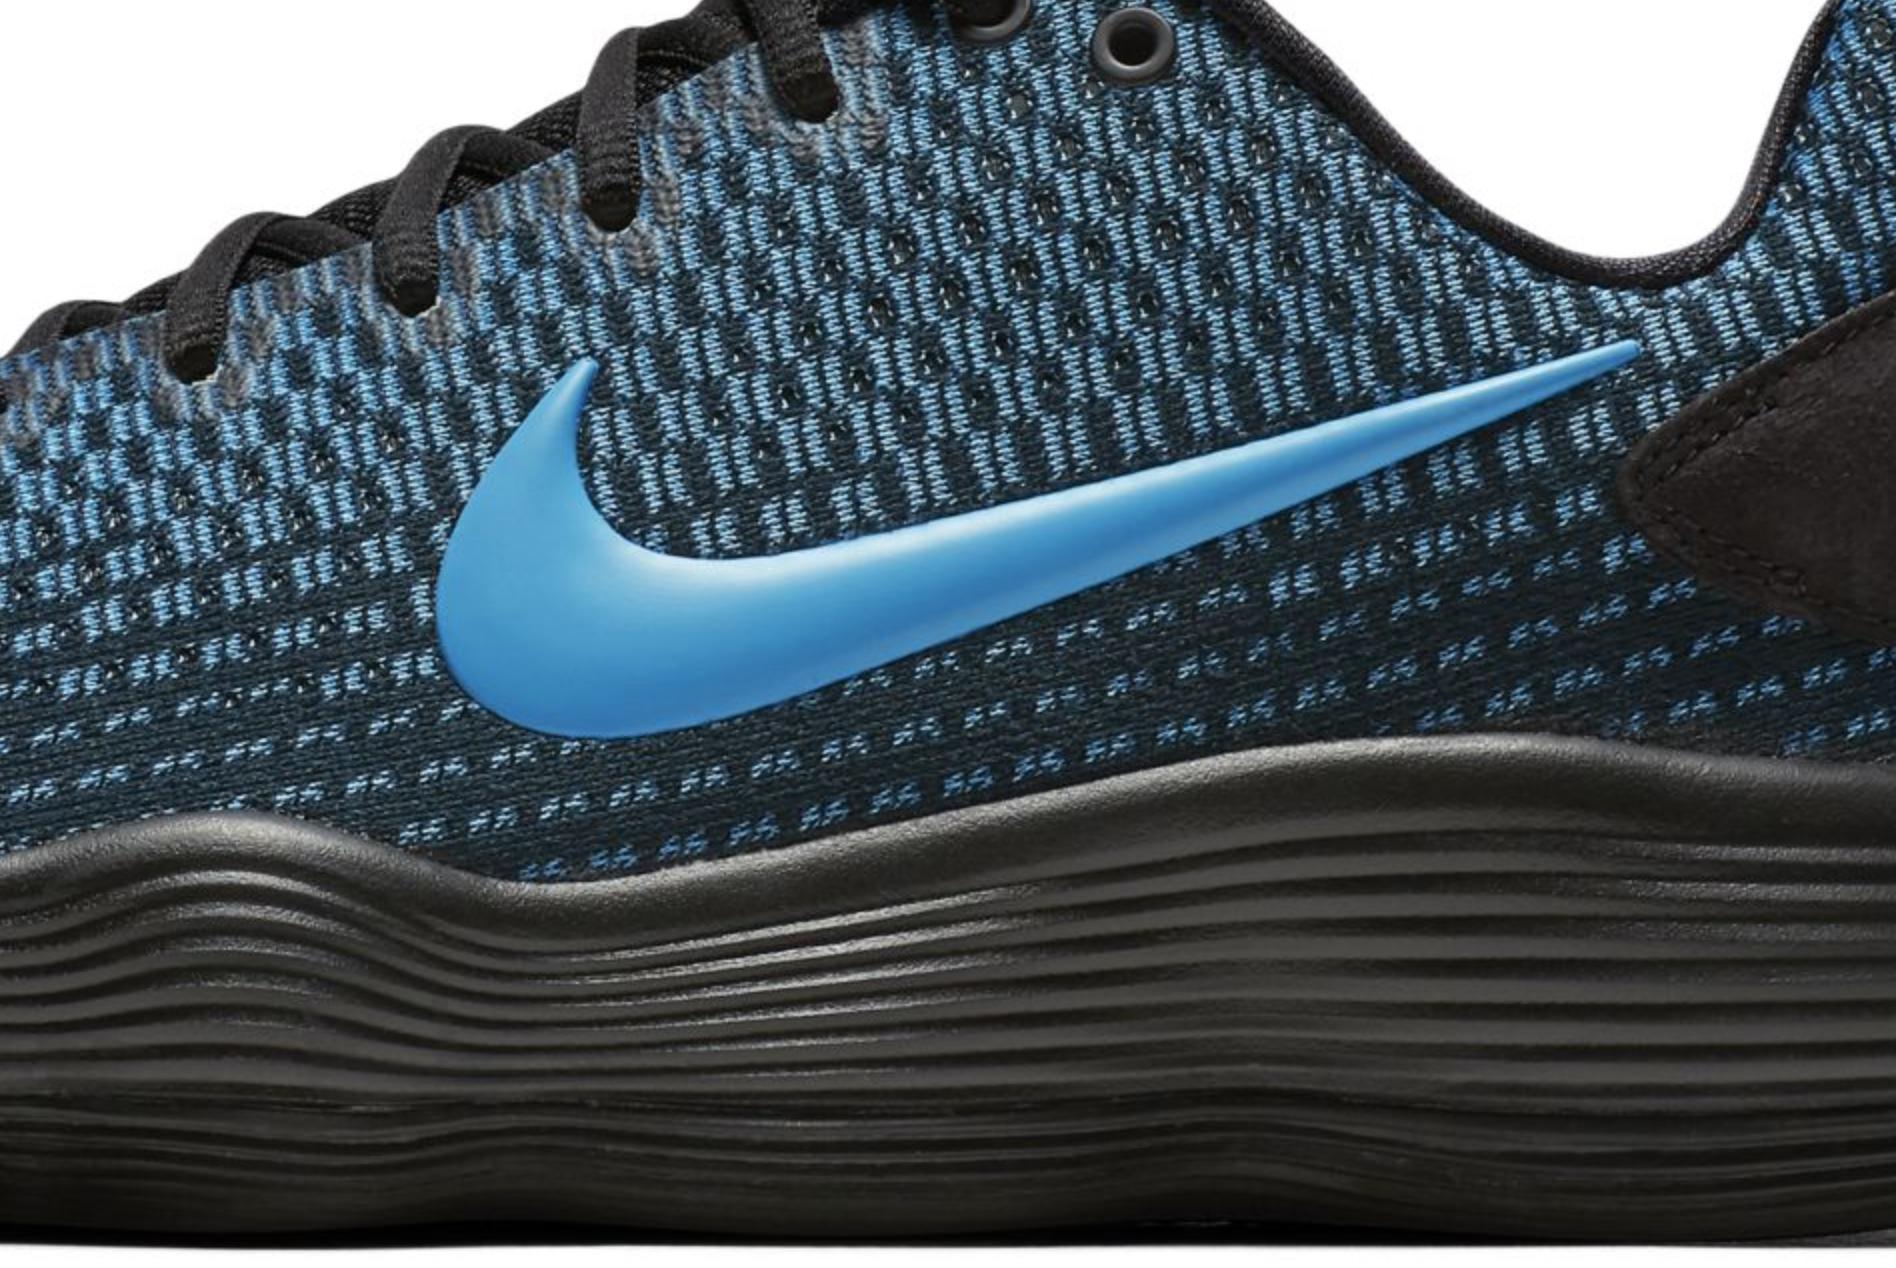 9cbfee96035b An Interesting Nike Hyperdunk 2017 Low Surfaces Online - WearTesters